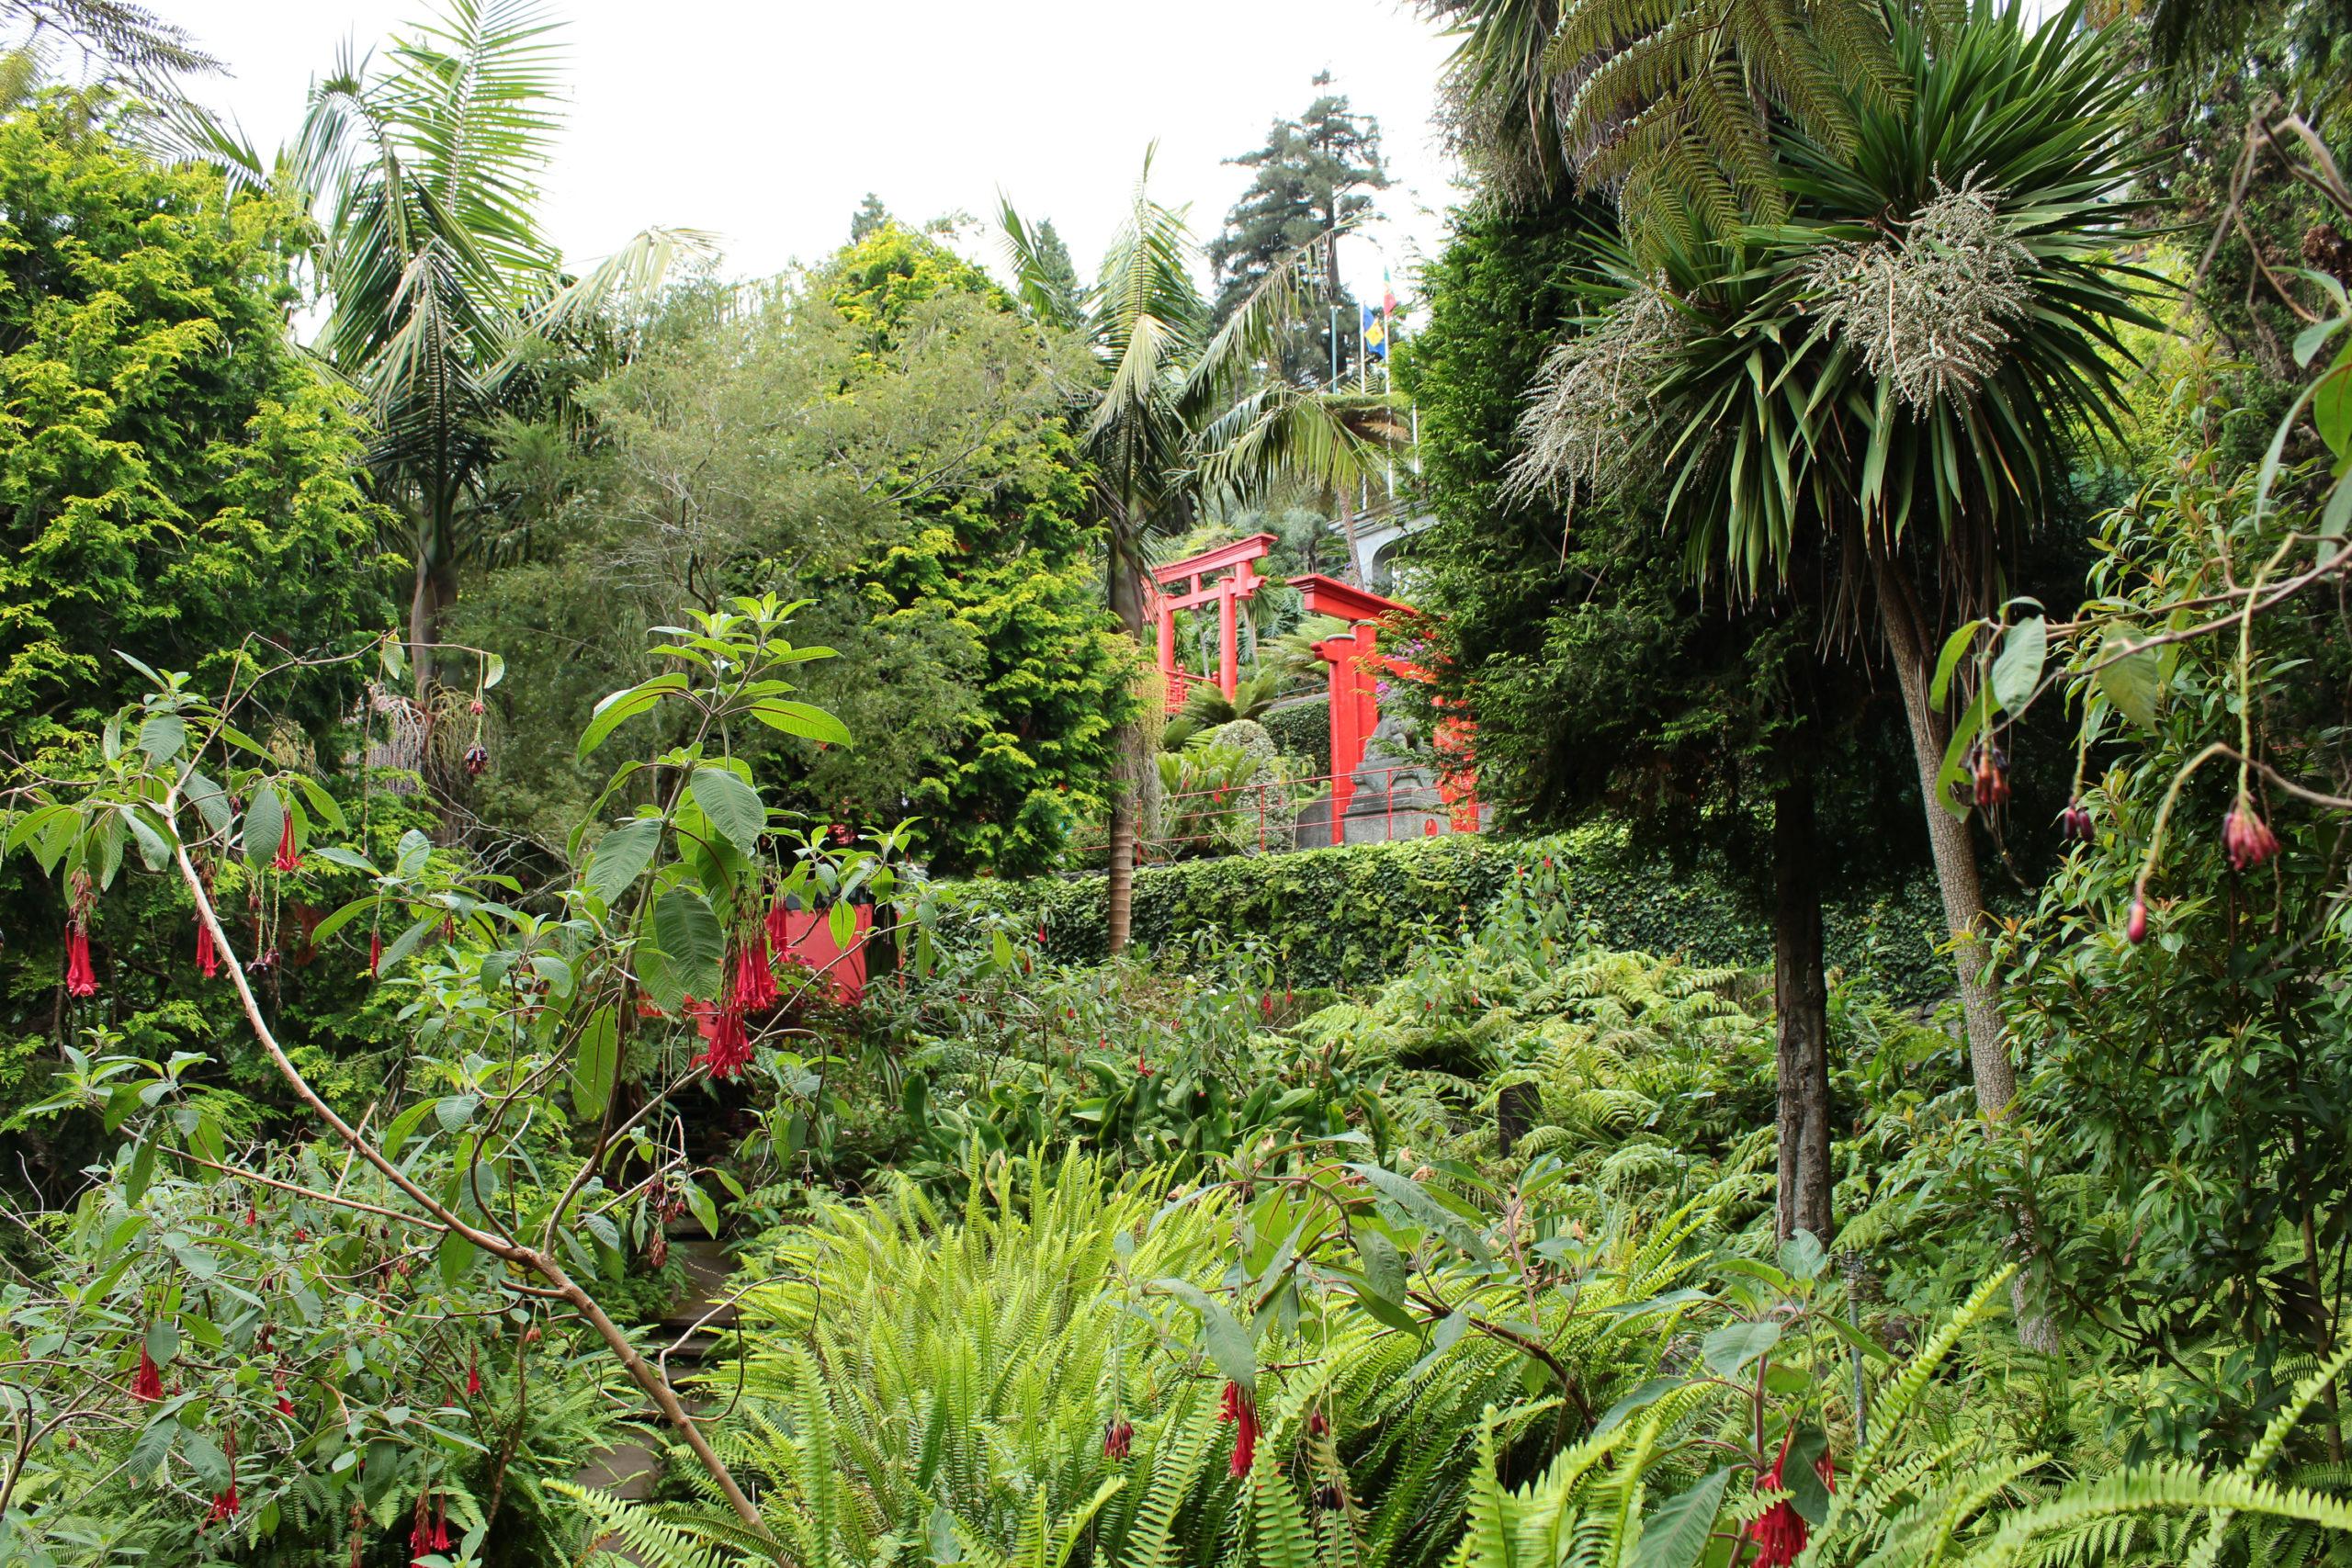 madera zielony ogród